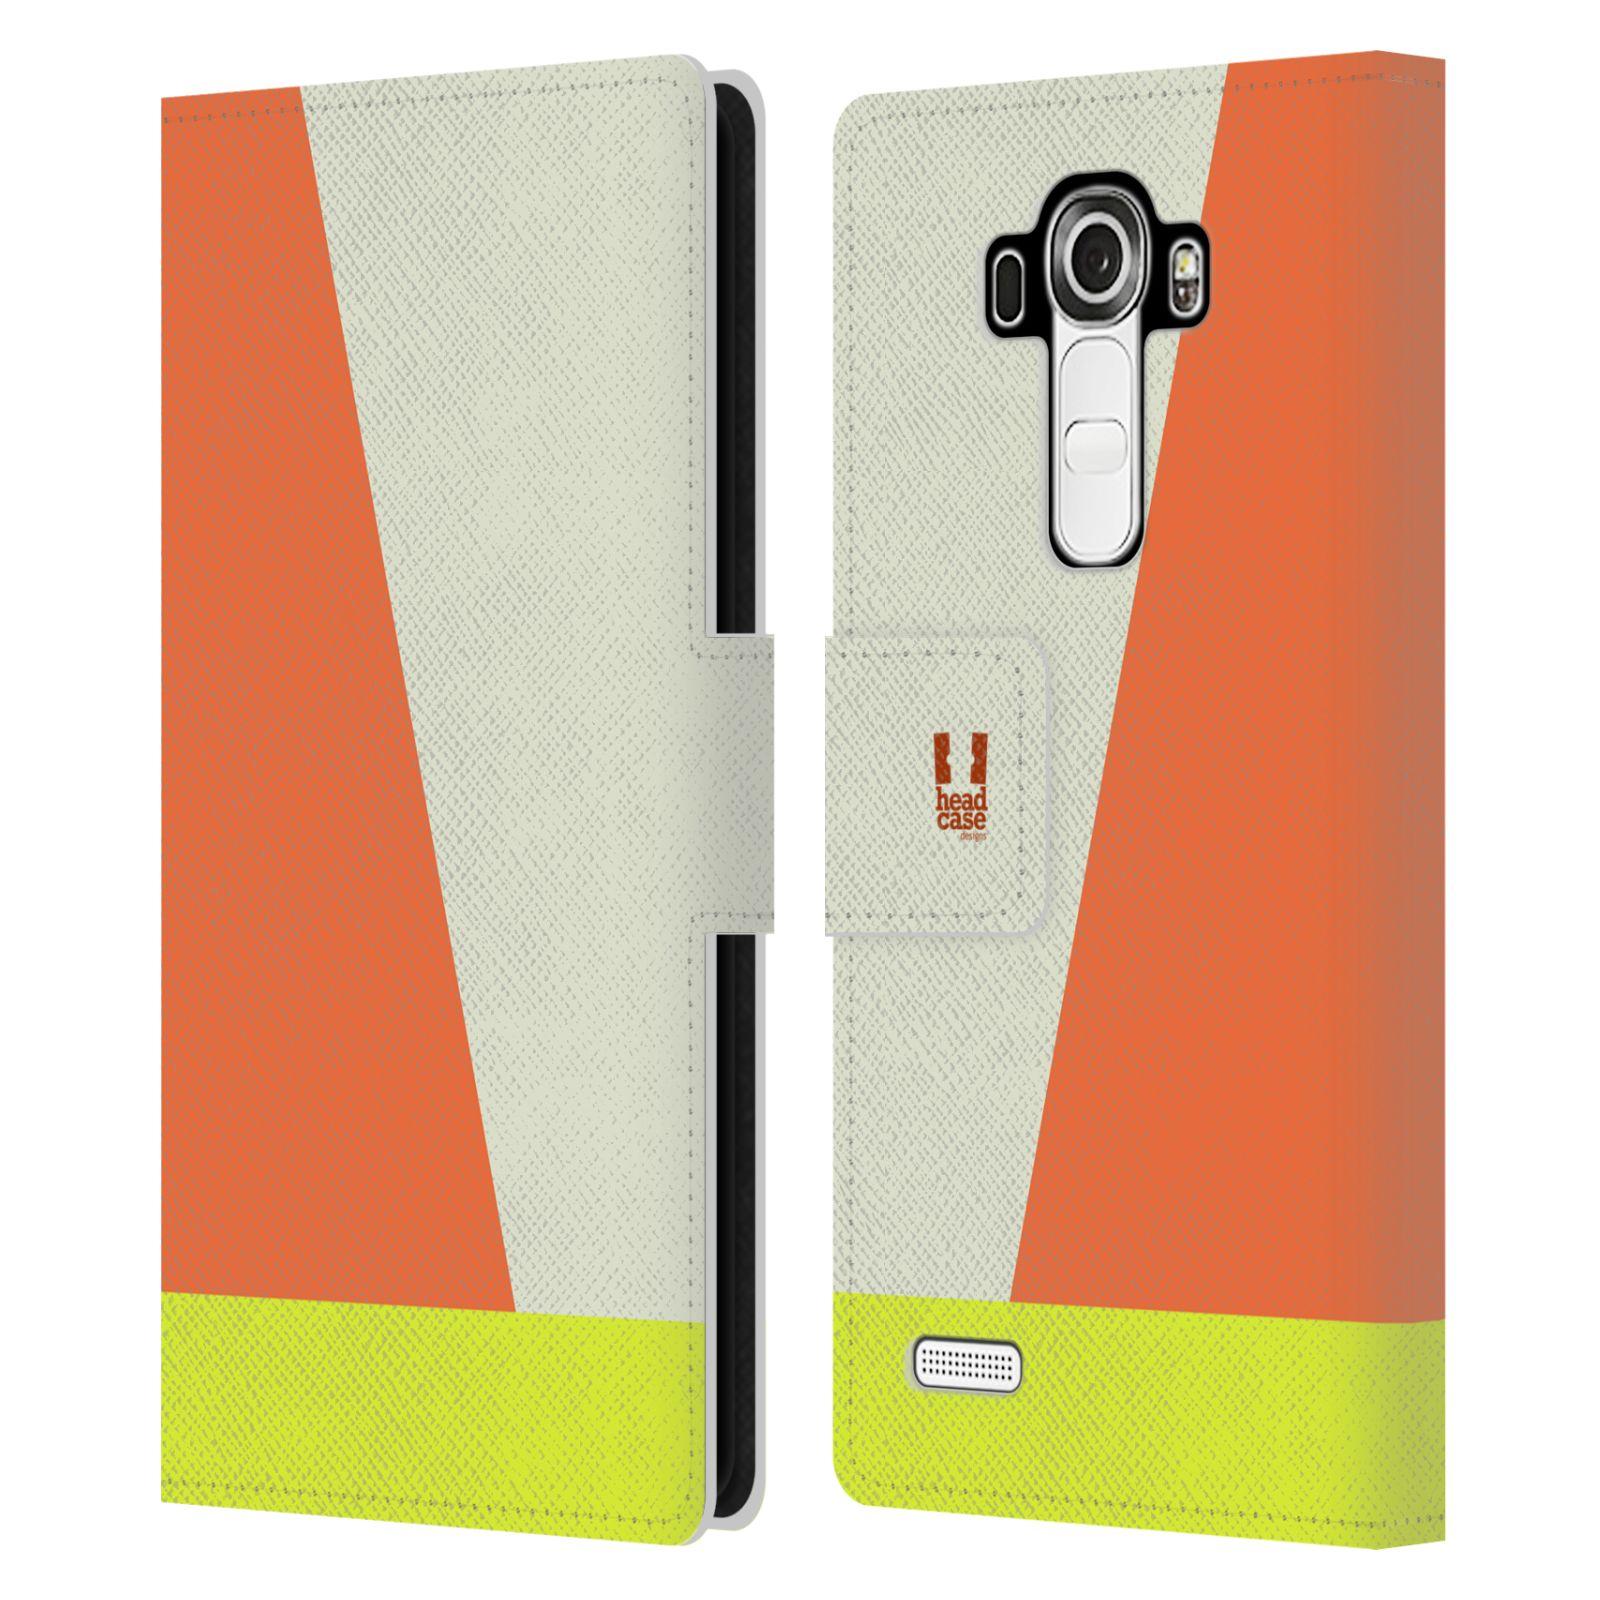 HEAD CASE Flipové pouzdro pro mobil LG G4 barevné tvary slonová kost